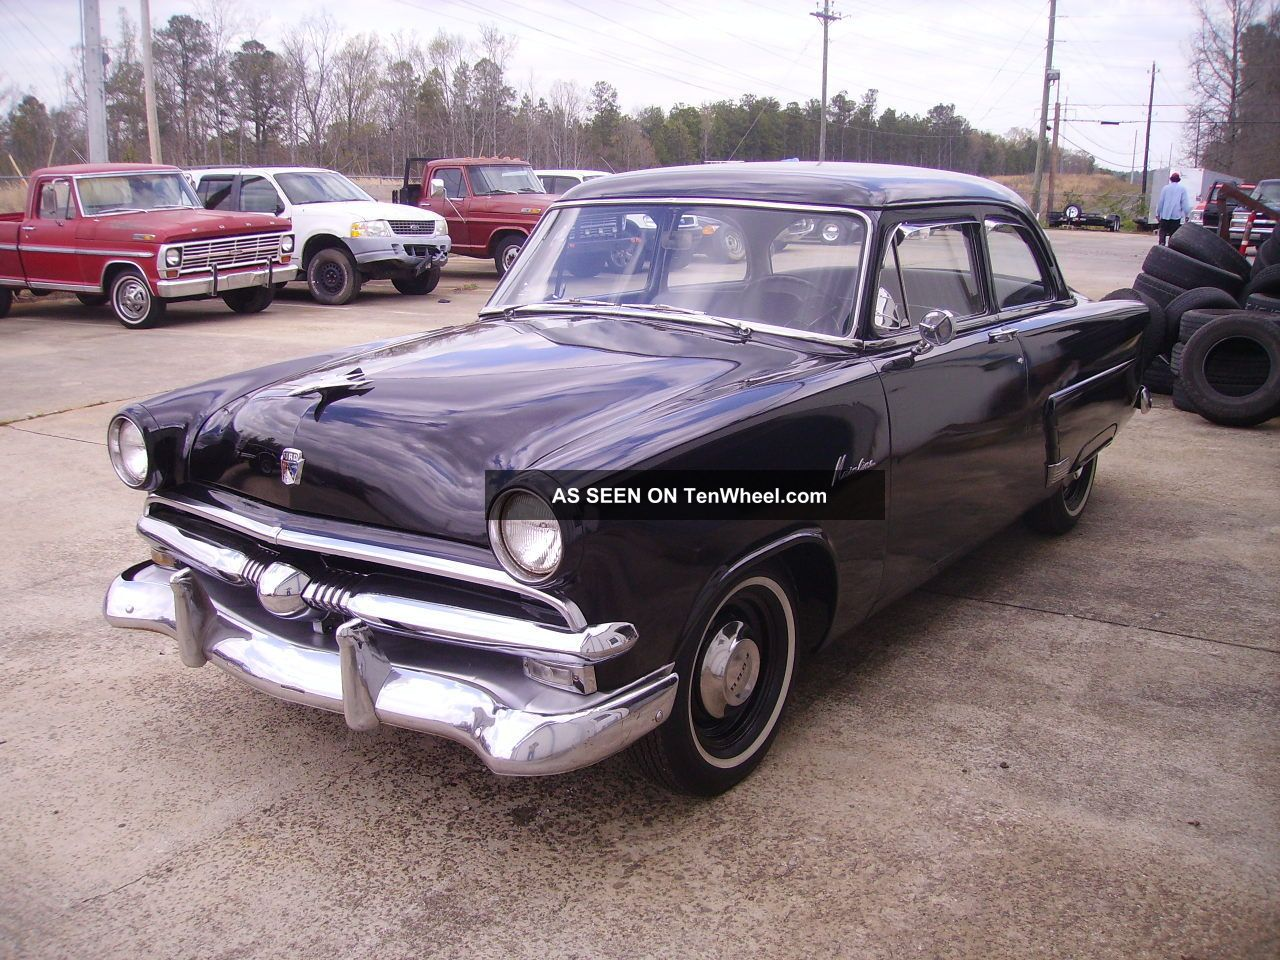 1953 Ford Mainline 2 Door 6 Volt 6 Cylinder 3 Speed On Column Solid Other photo